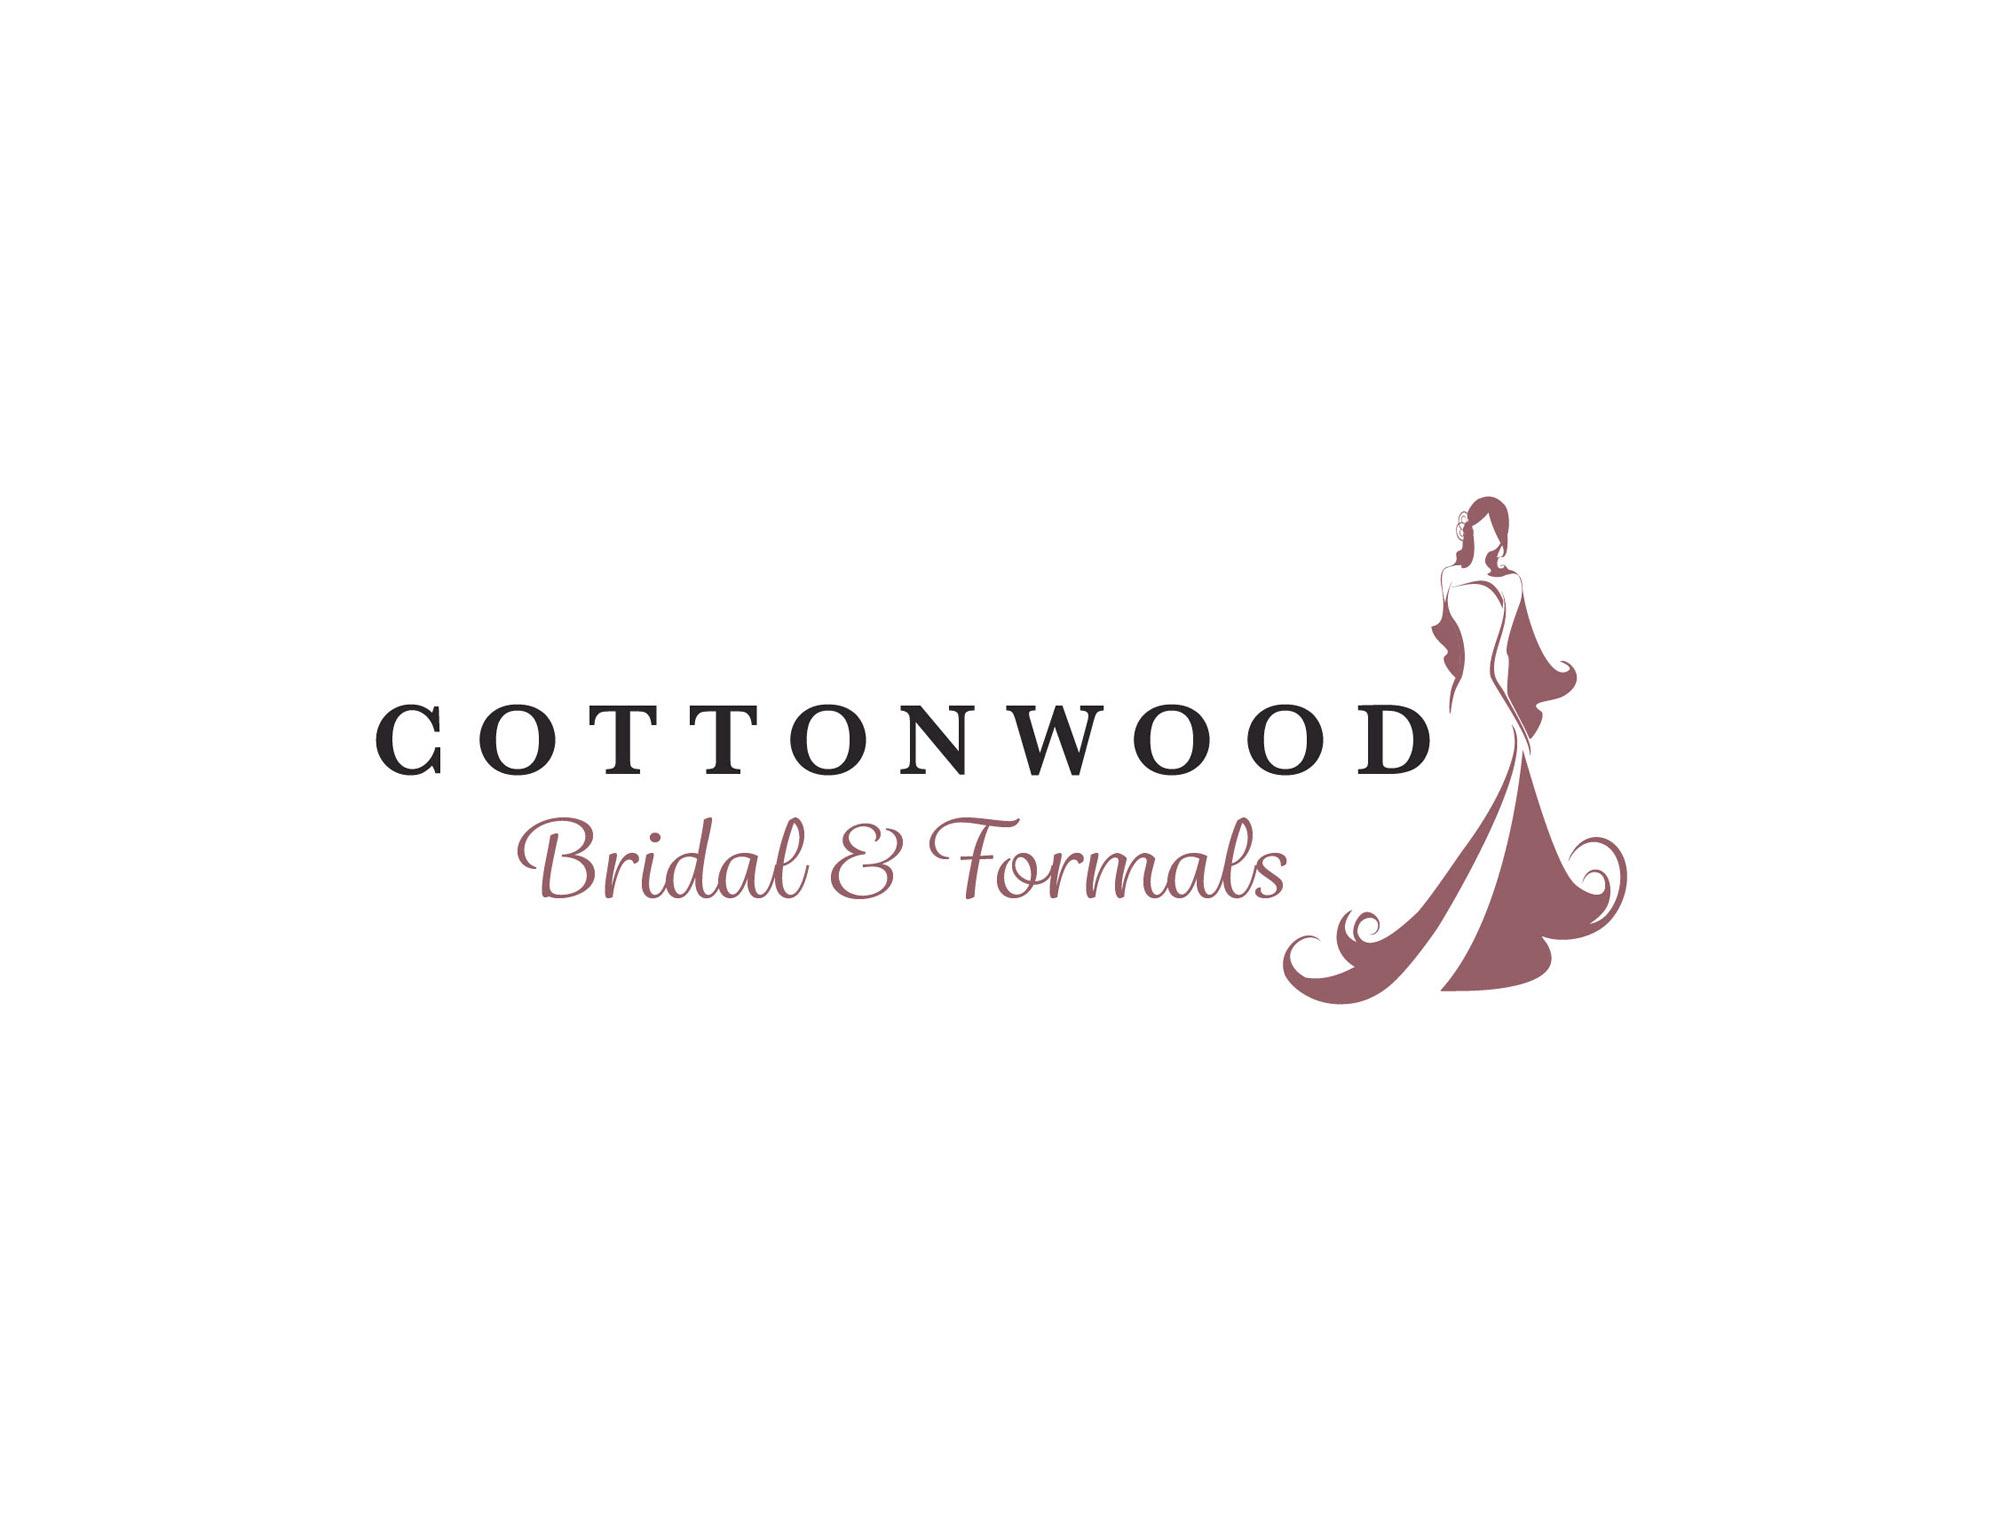 Cottonwood Bridal_logo.jpg